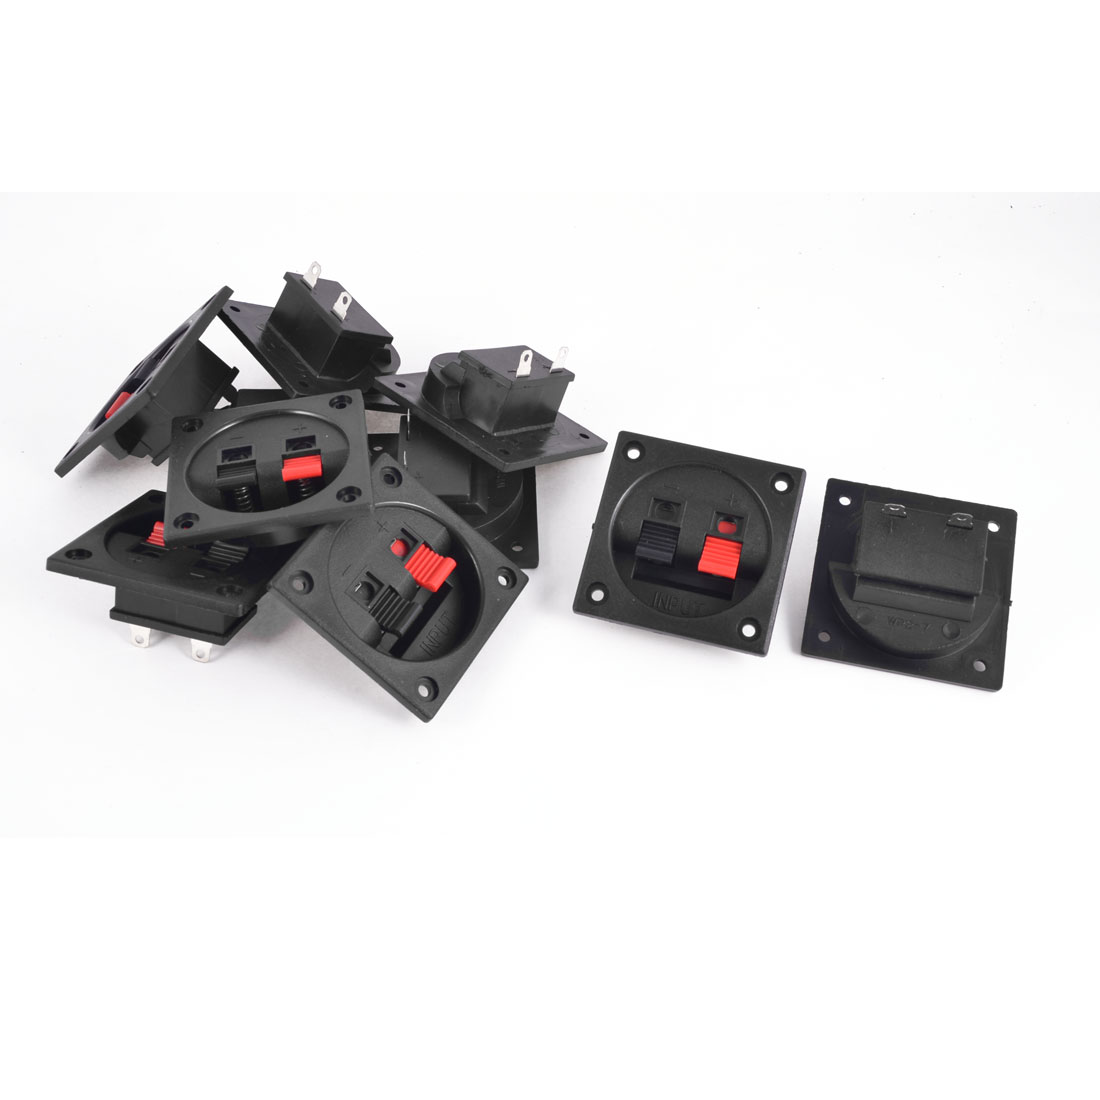 10 Pcs Plastic Square Shape 2 Position Spring Clip Audio Speaker Terminals Red Black